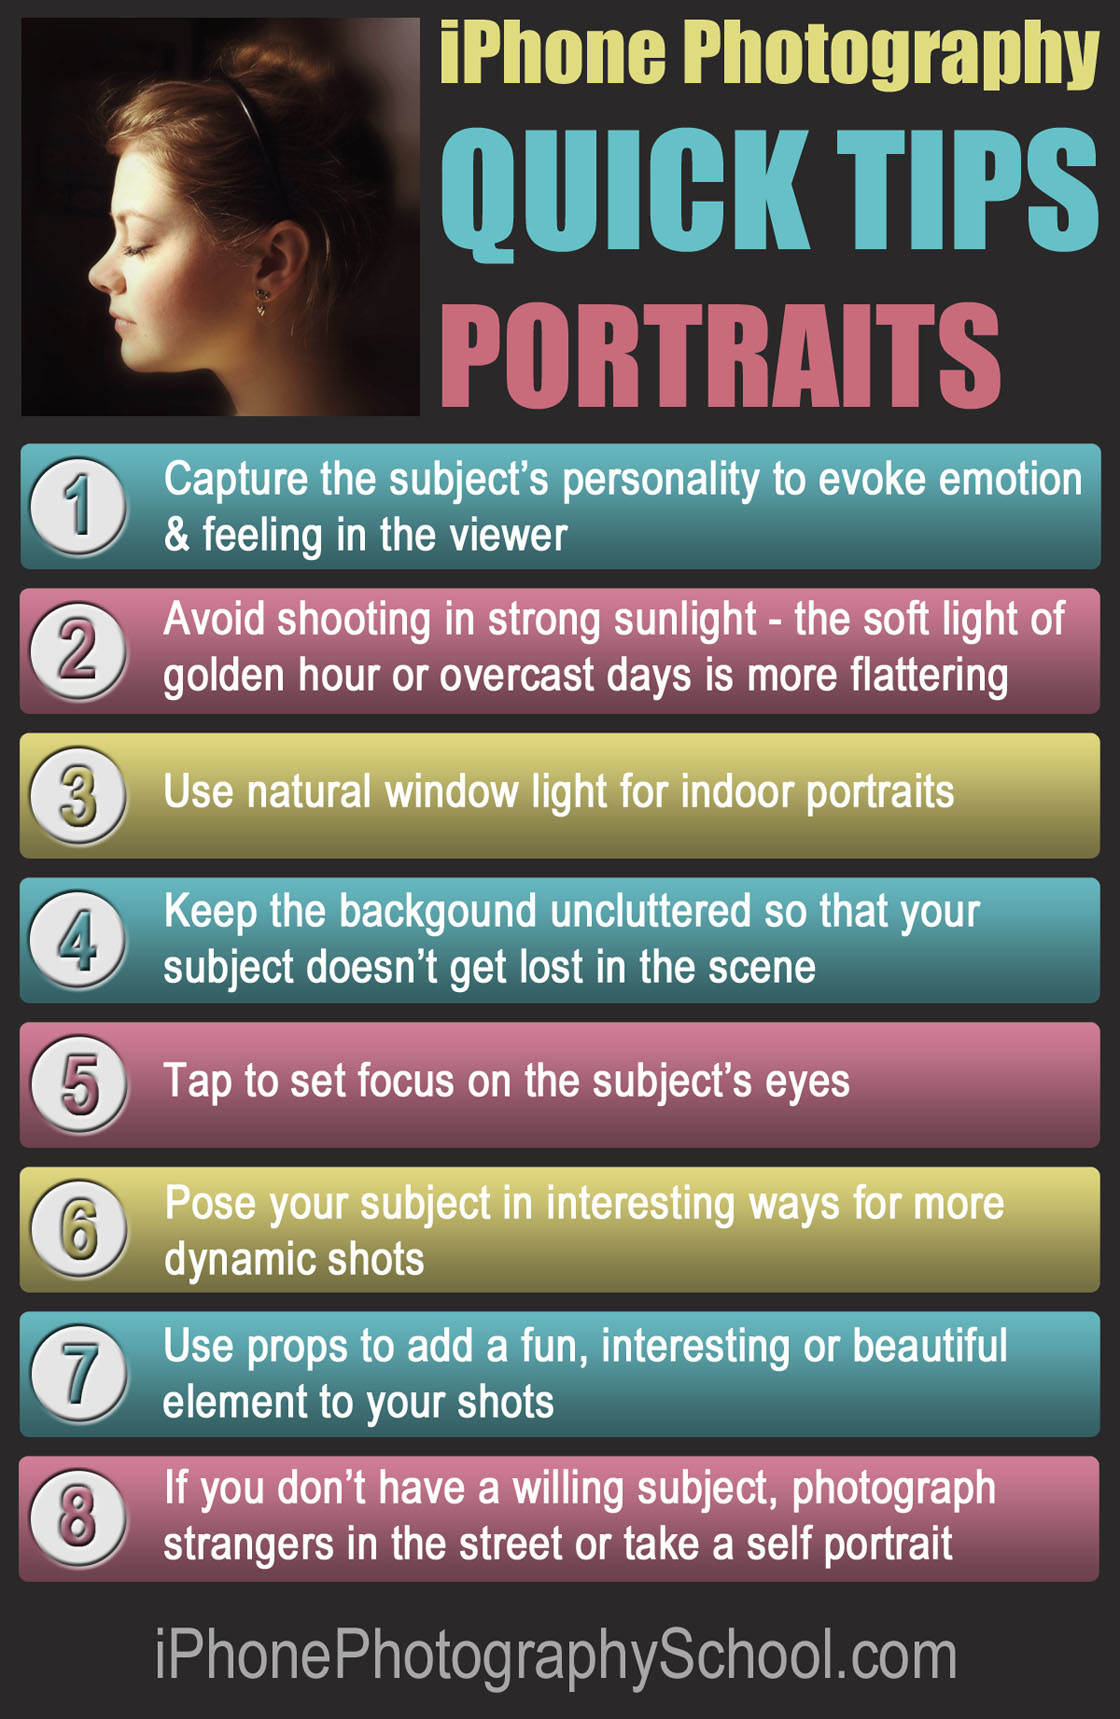 iPhone Portrait Quick Tips